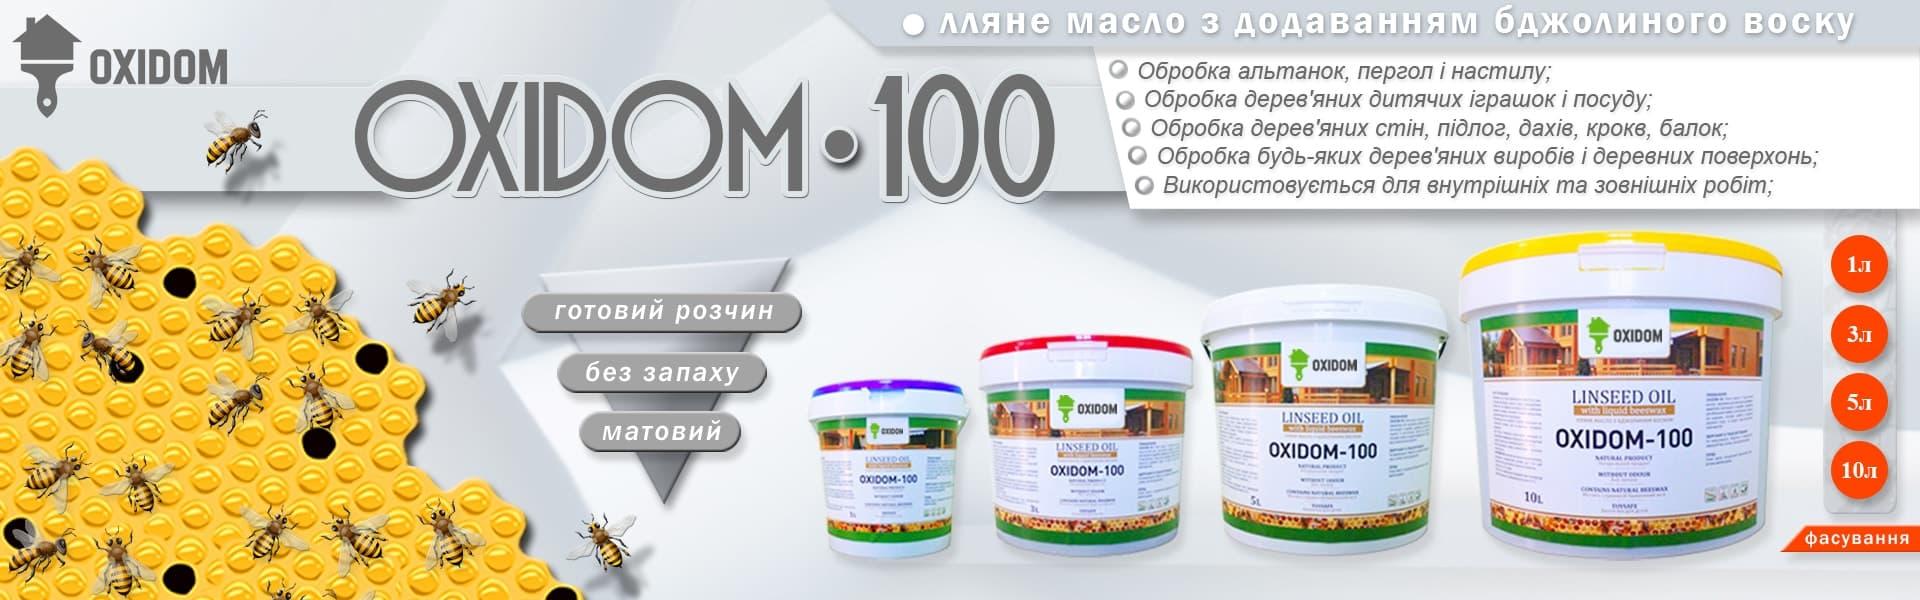 banner oxidom 100